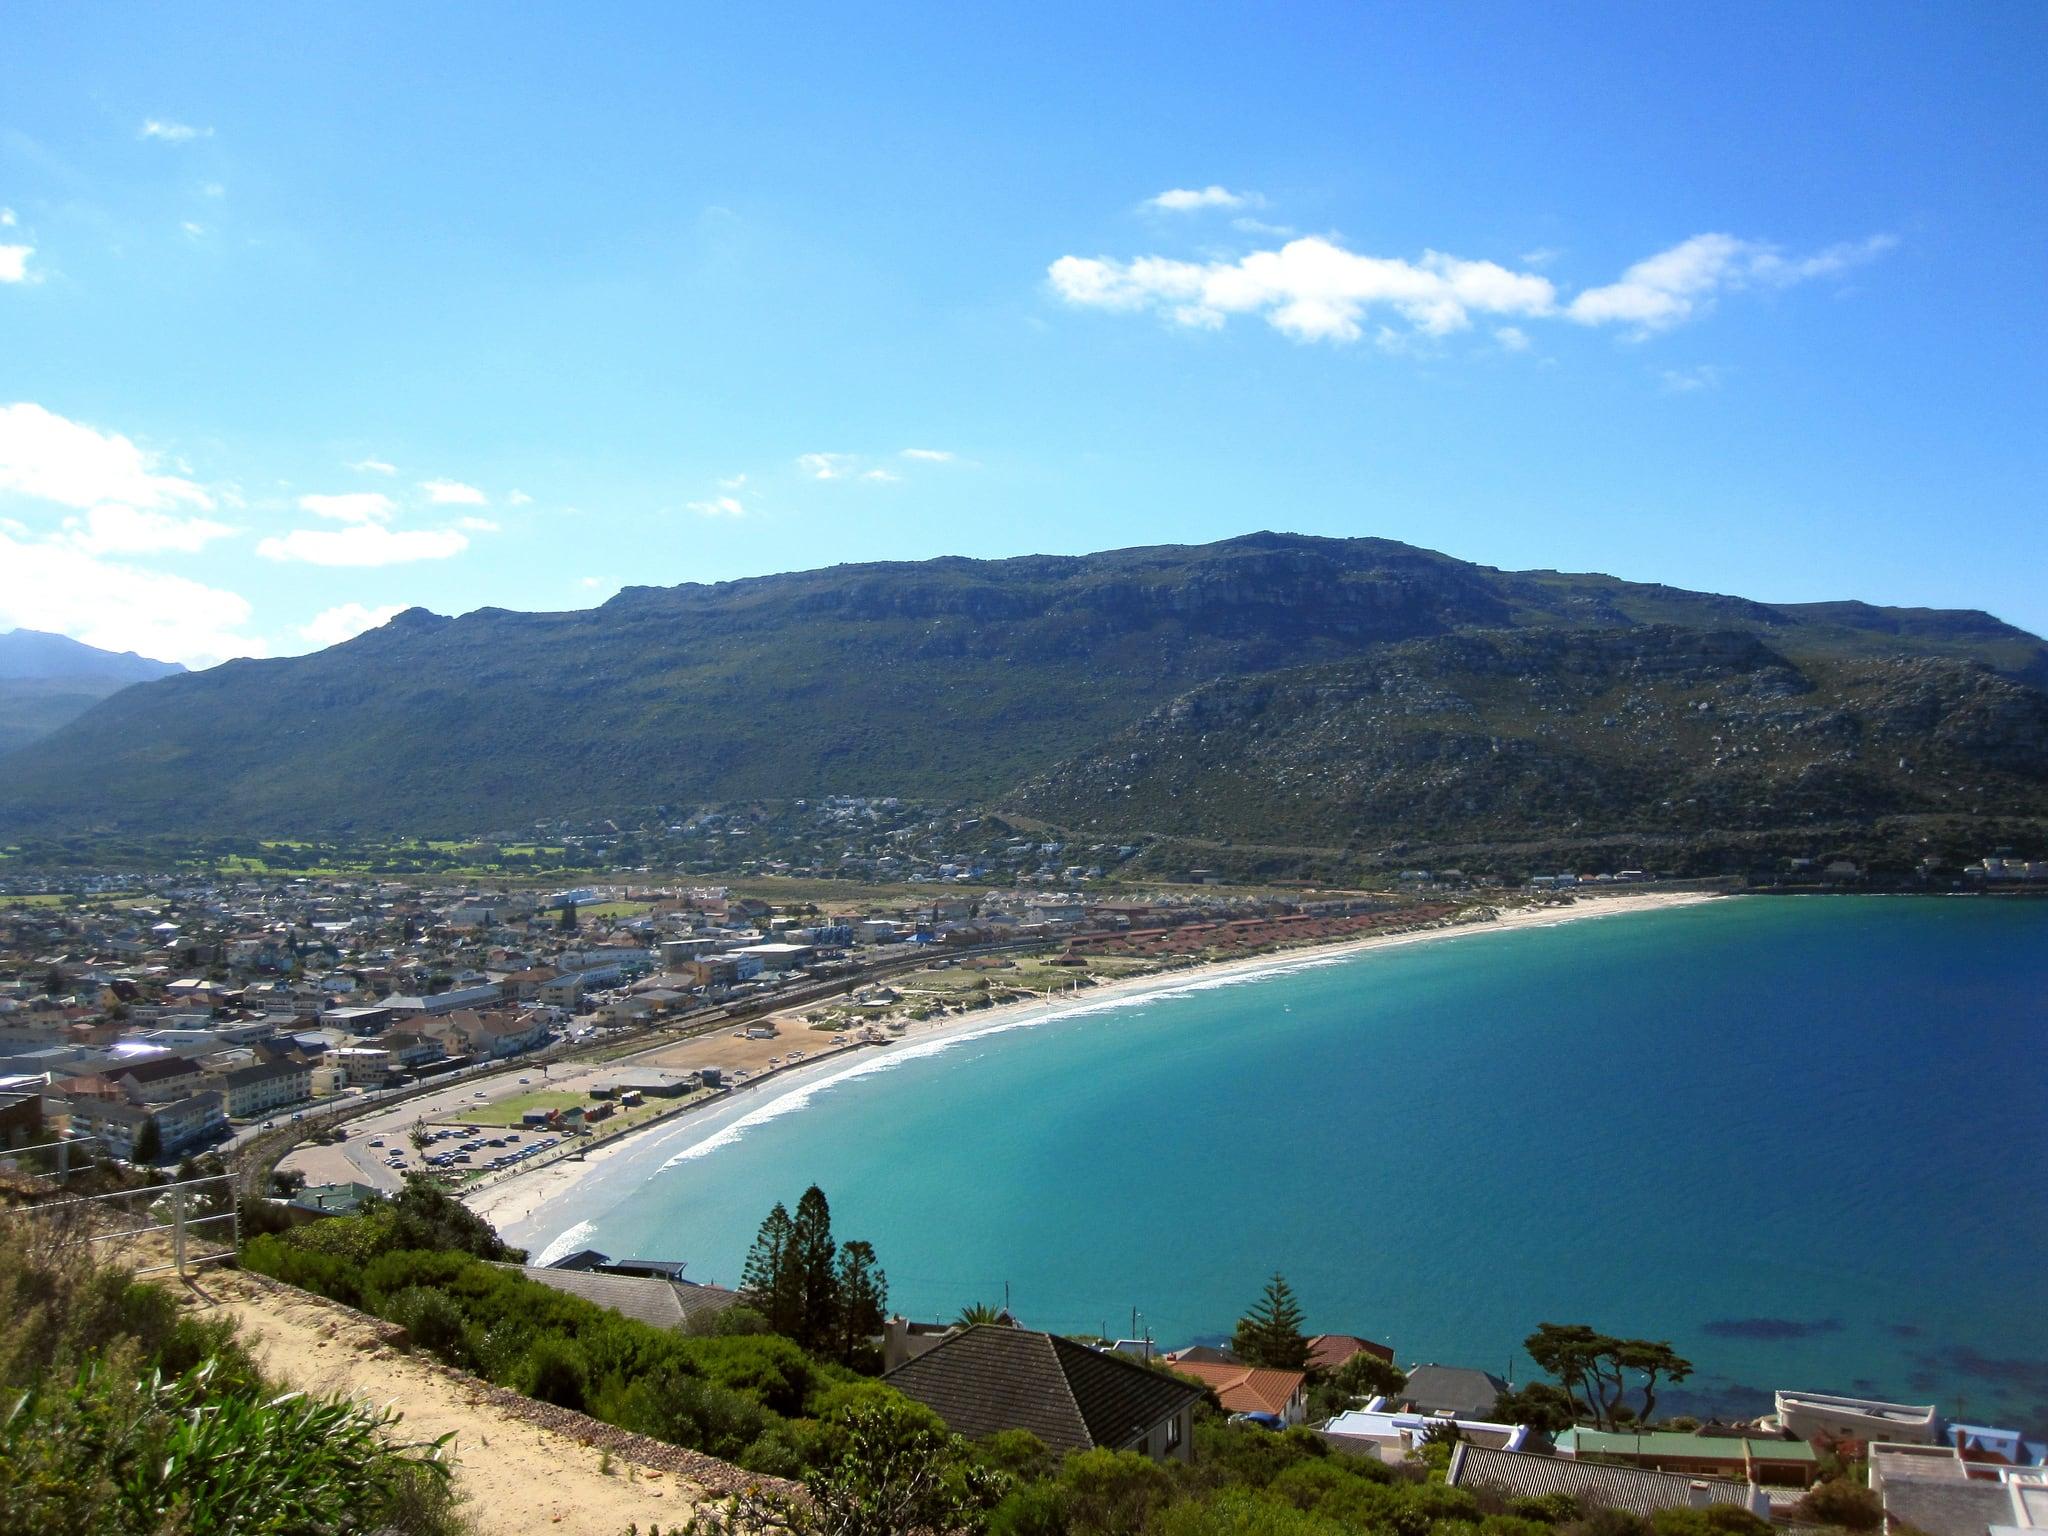 Obrázek Fish Hoek Beach. southafrica capeprovince